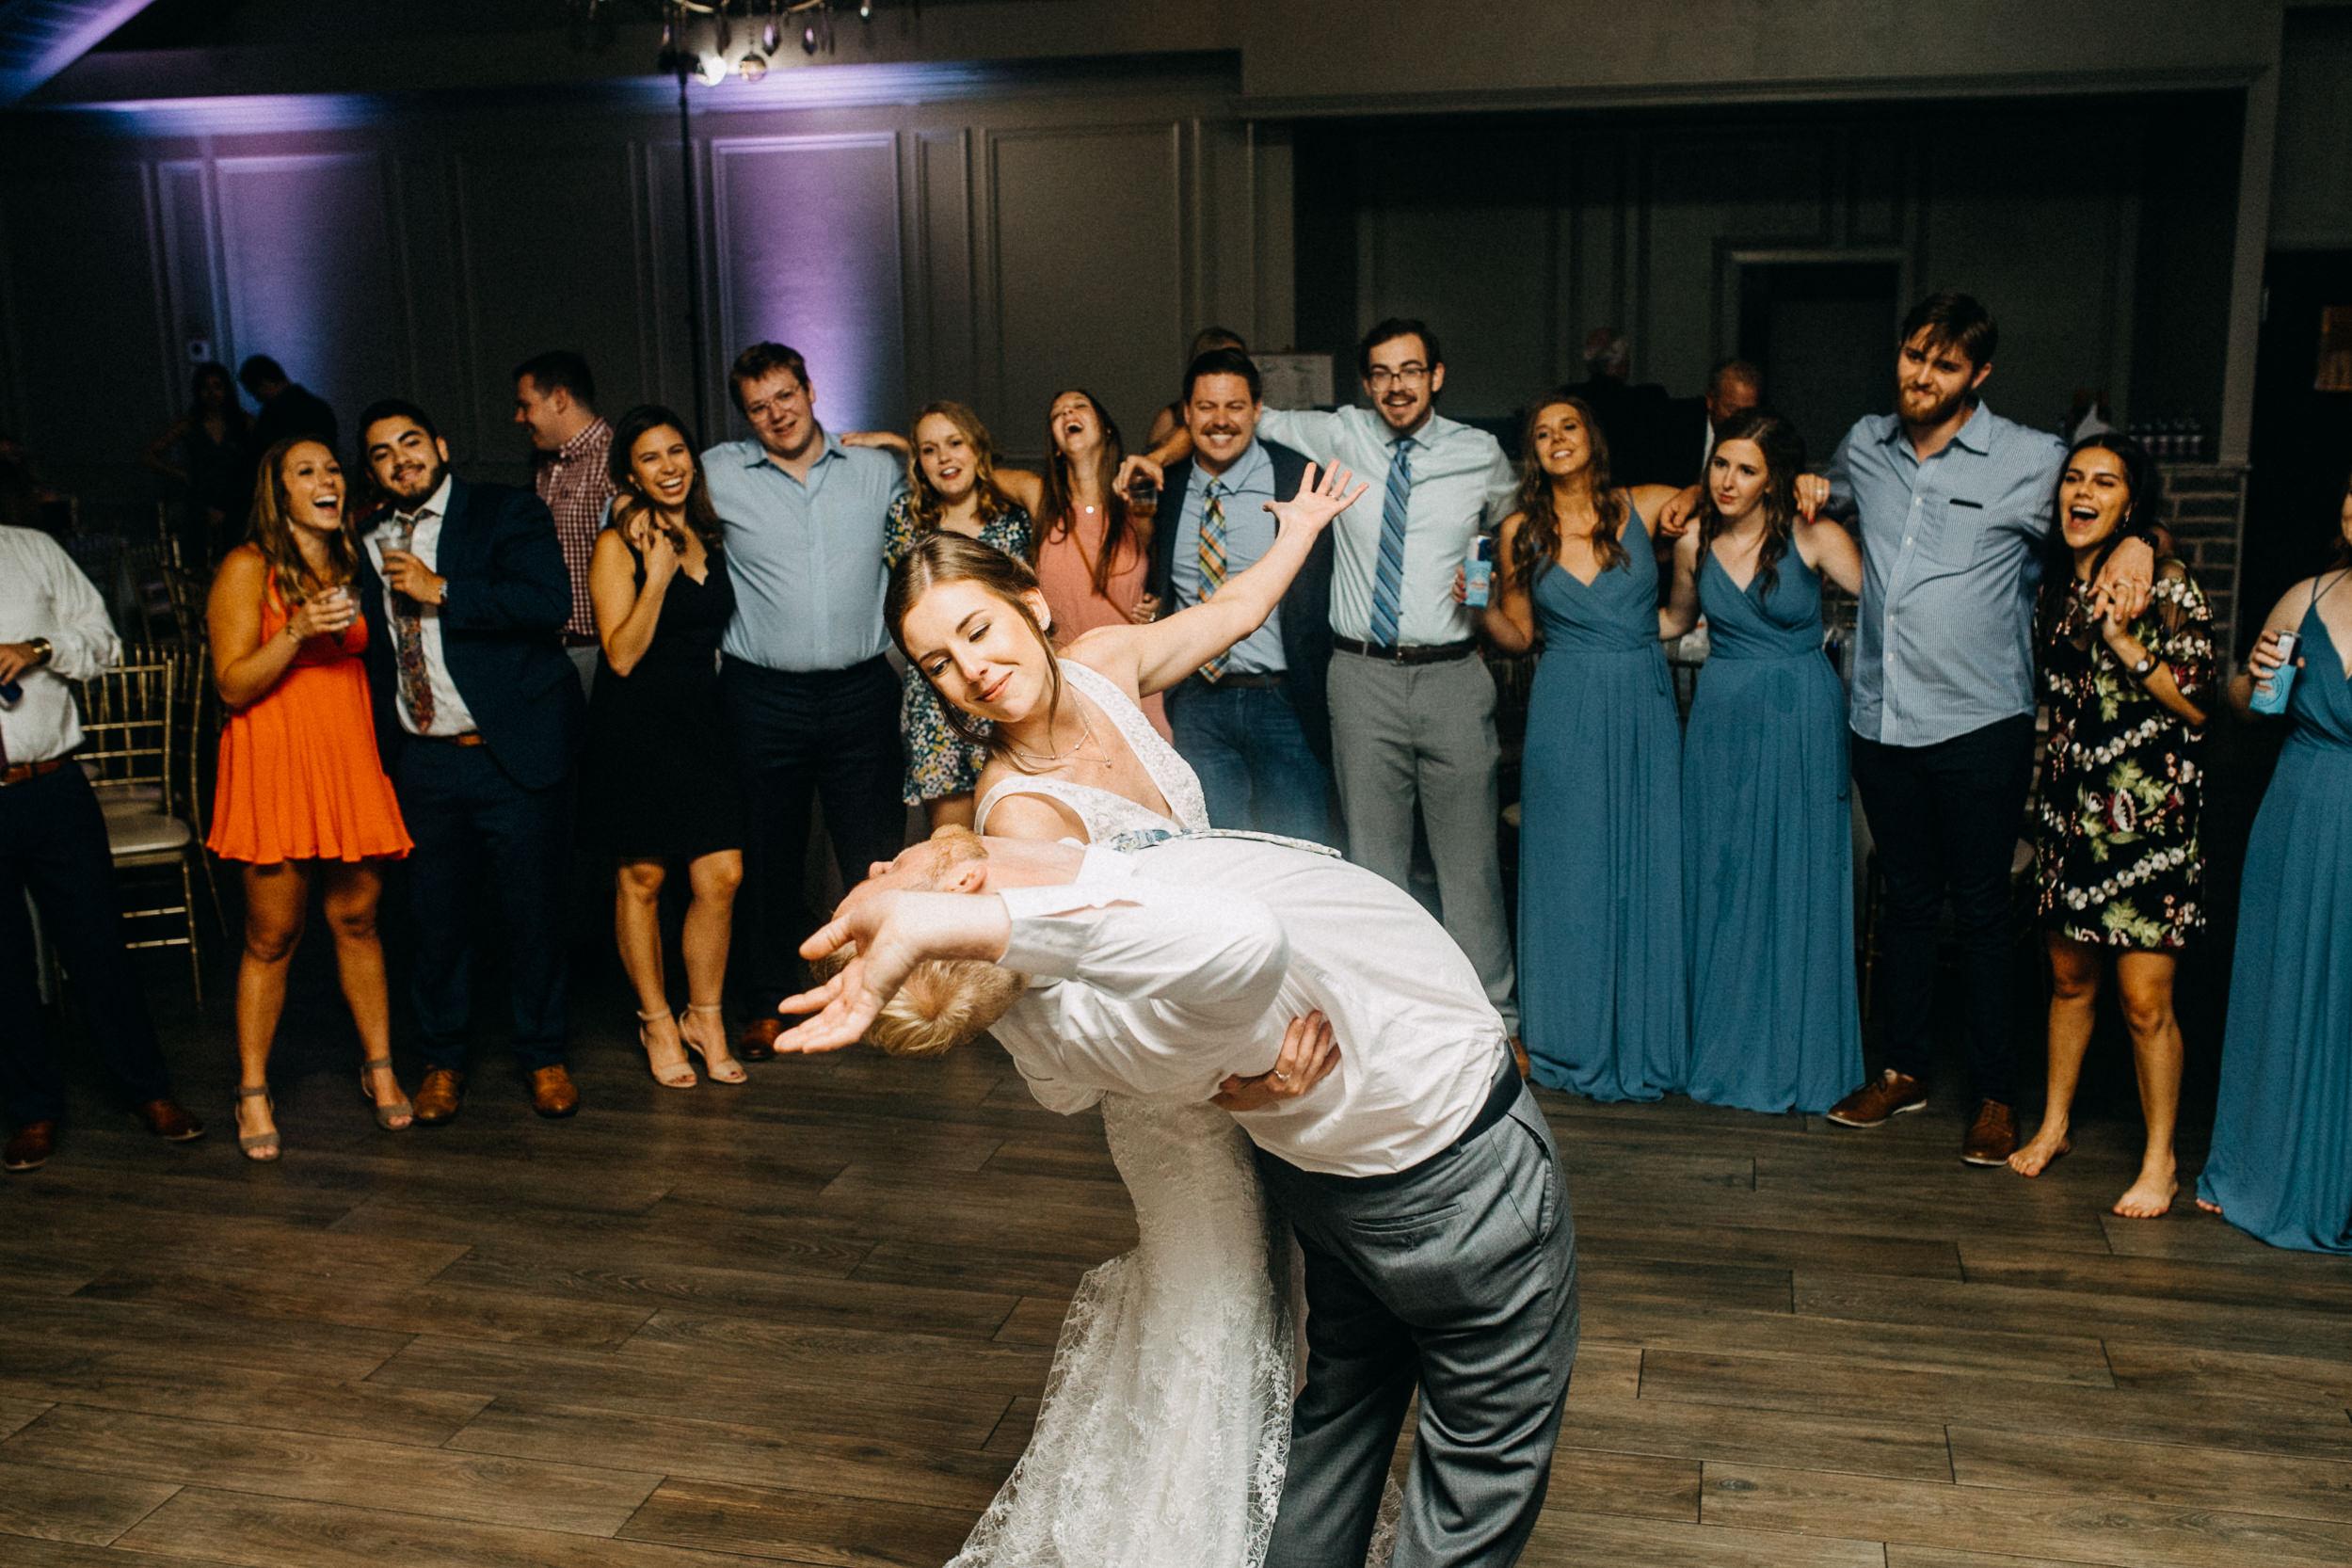 okc-wedding-photographer-coles-garden-wedding-okc-best-wedding-photographers-194.jpg